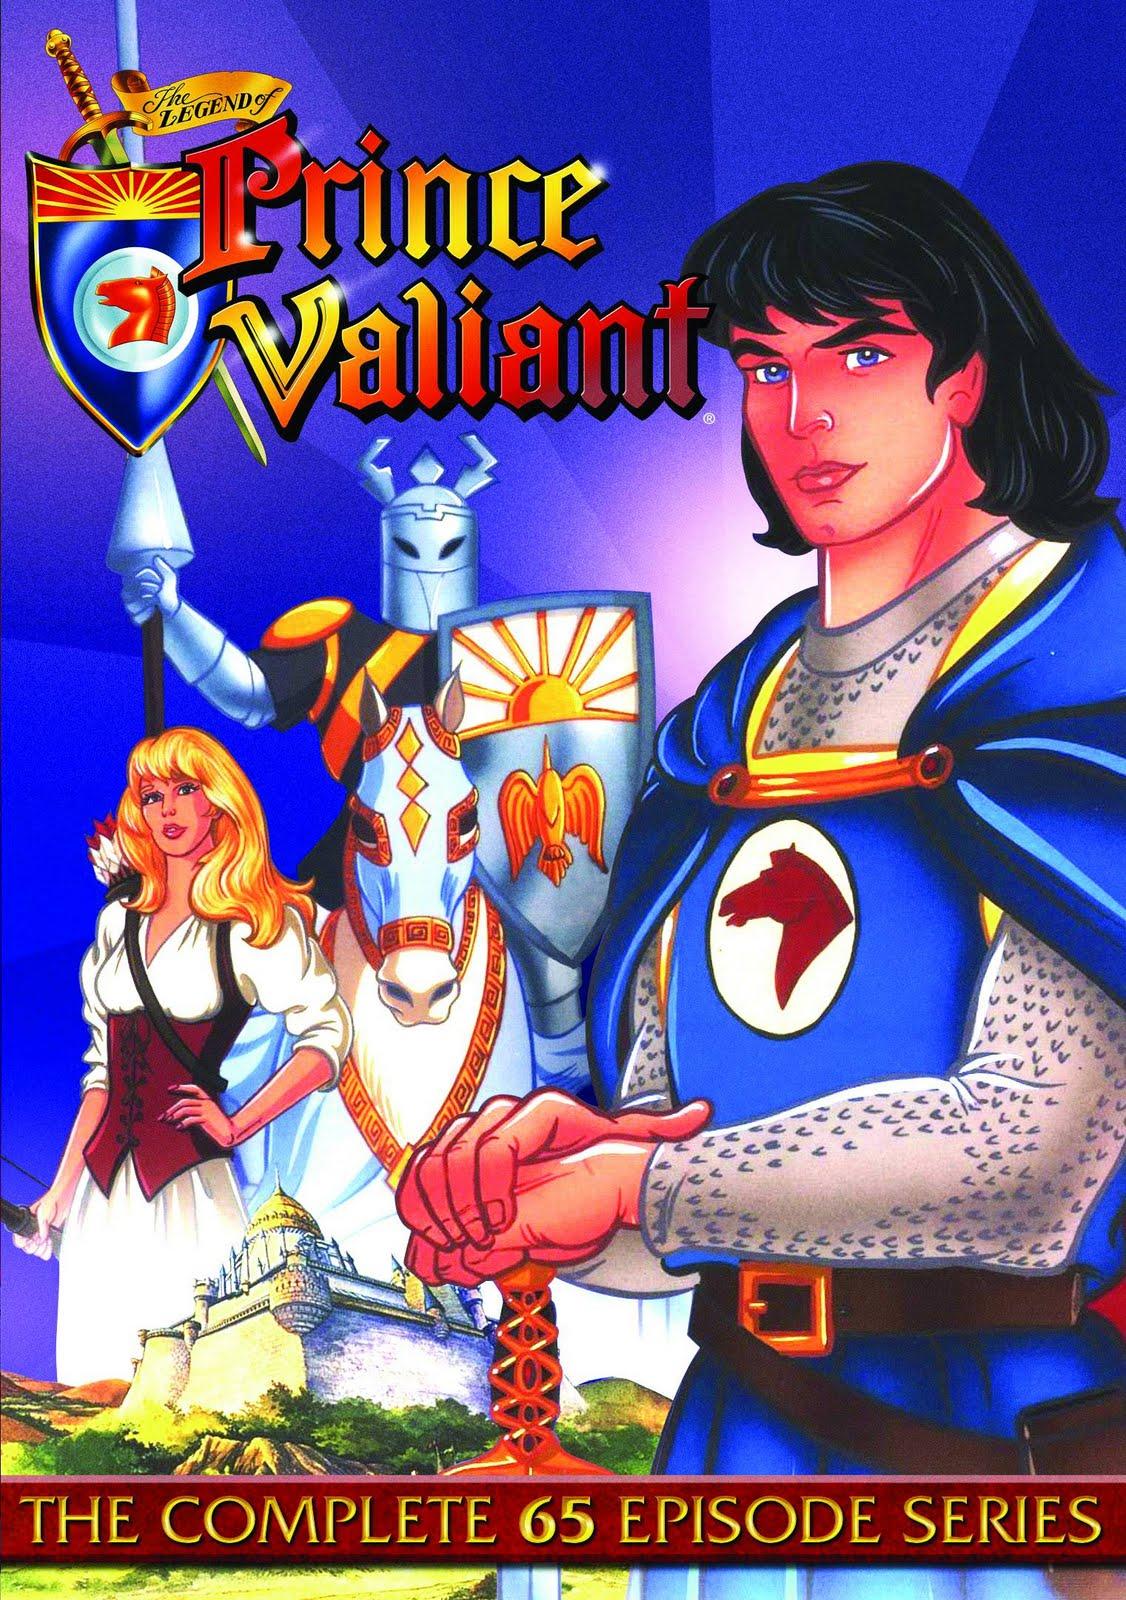 Prince Valiant | Quondam et Futurus | FANDOM powered by Wikia